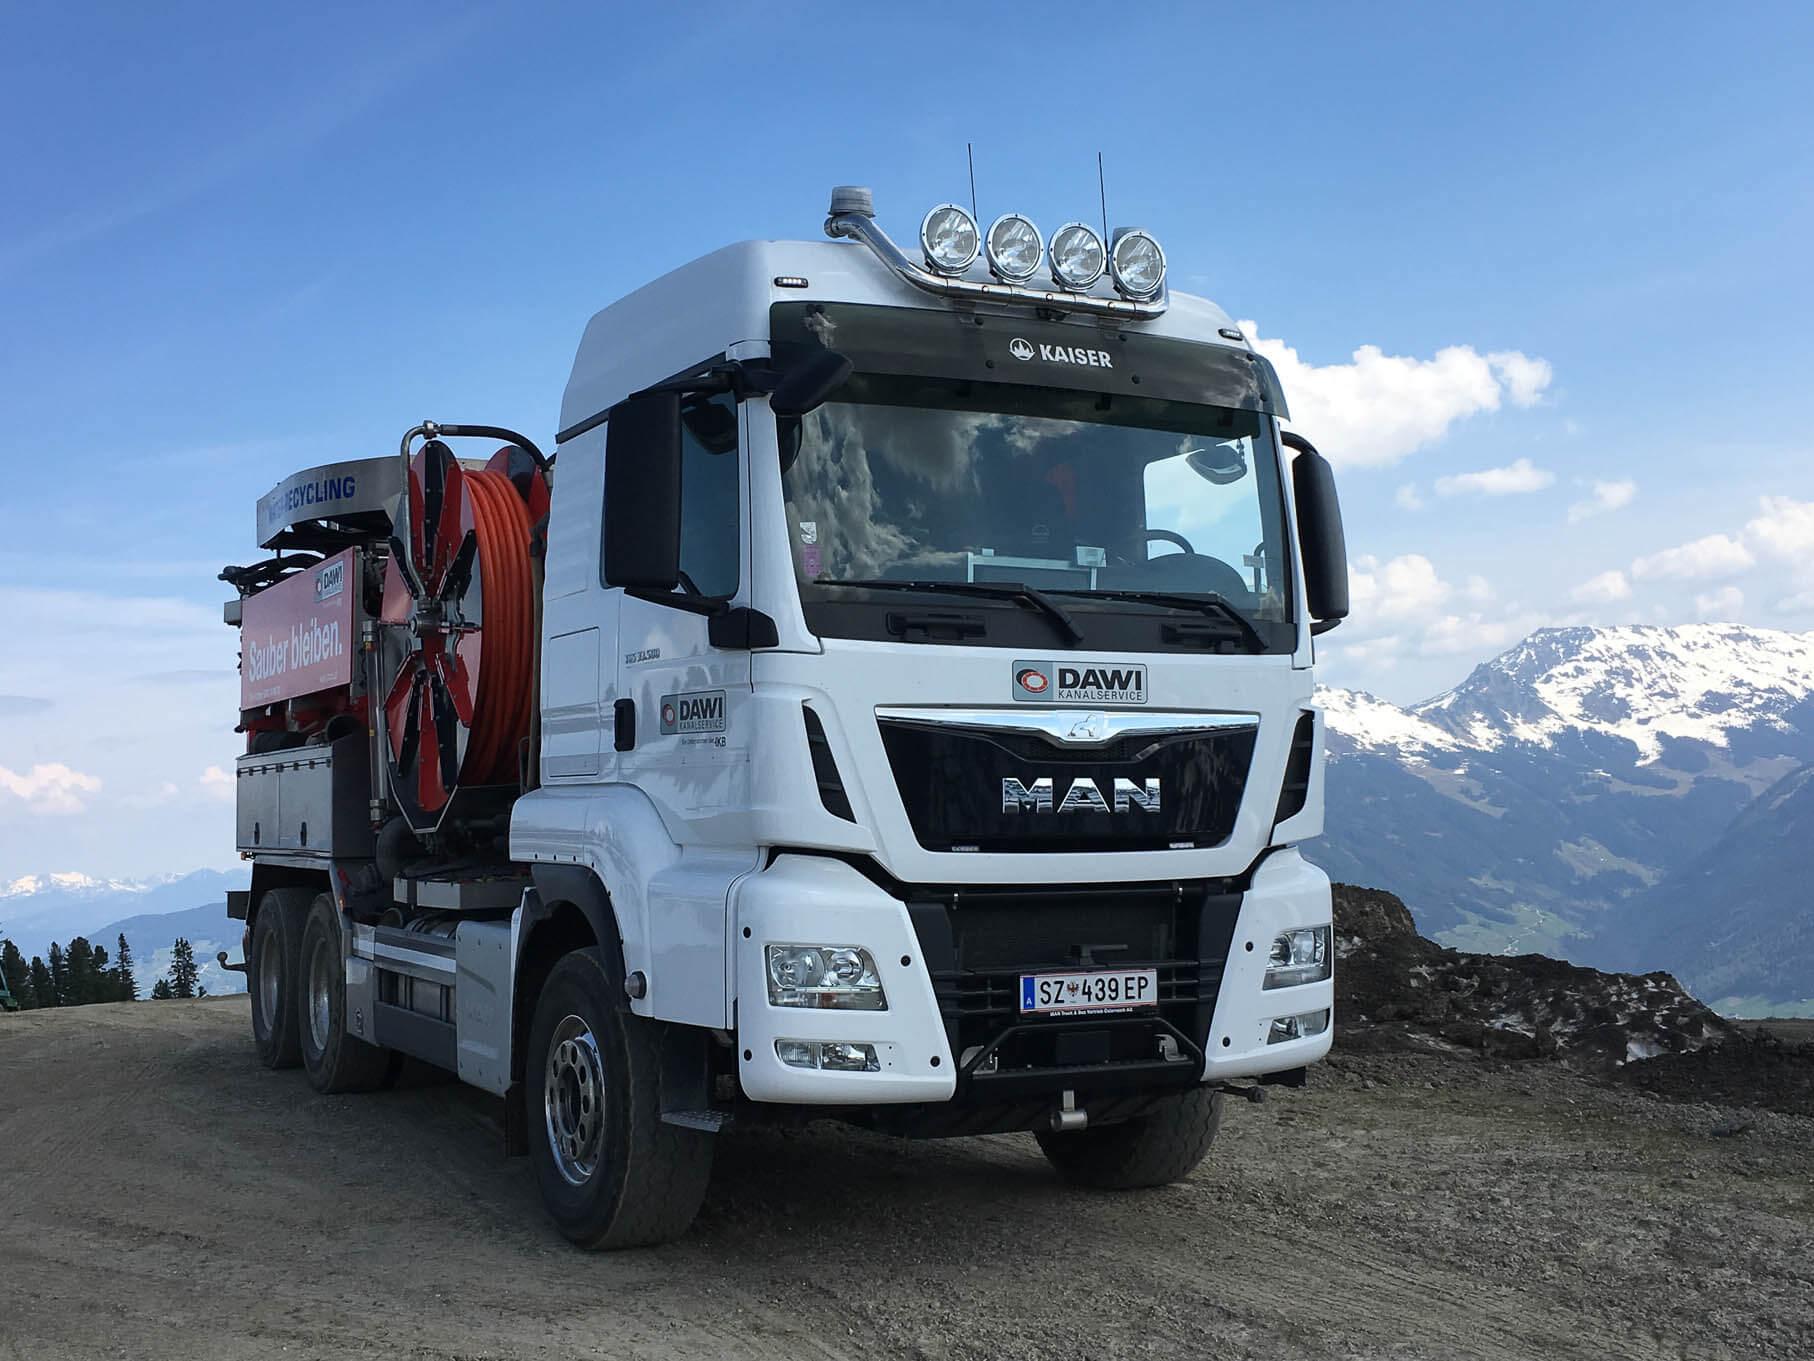 DAWI Spülfahrzeug steht auf einem Berg